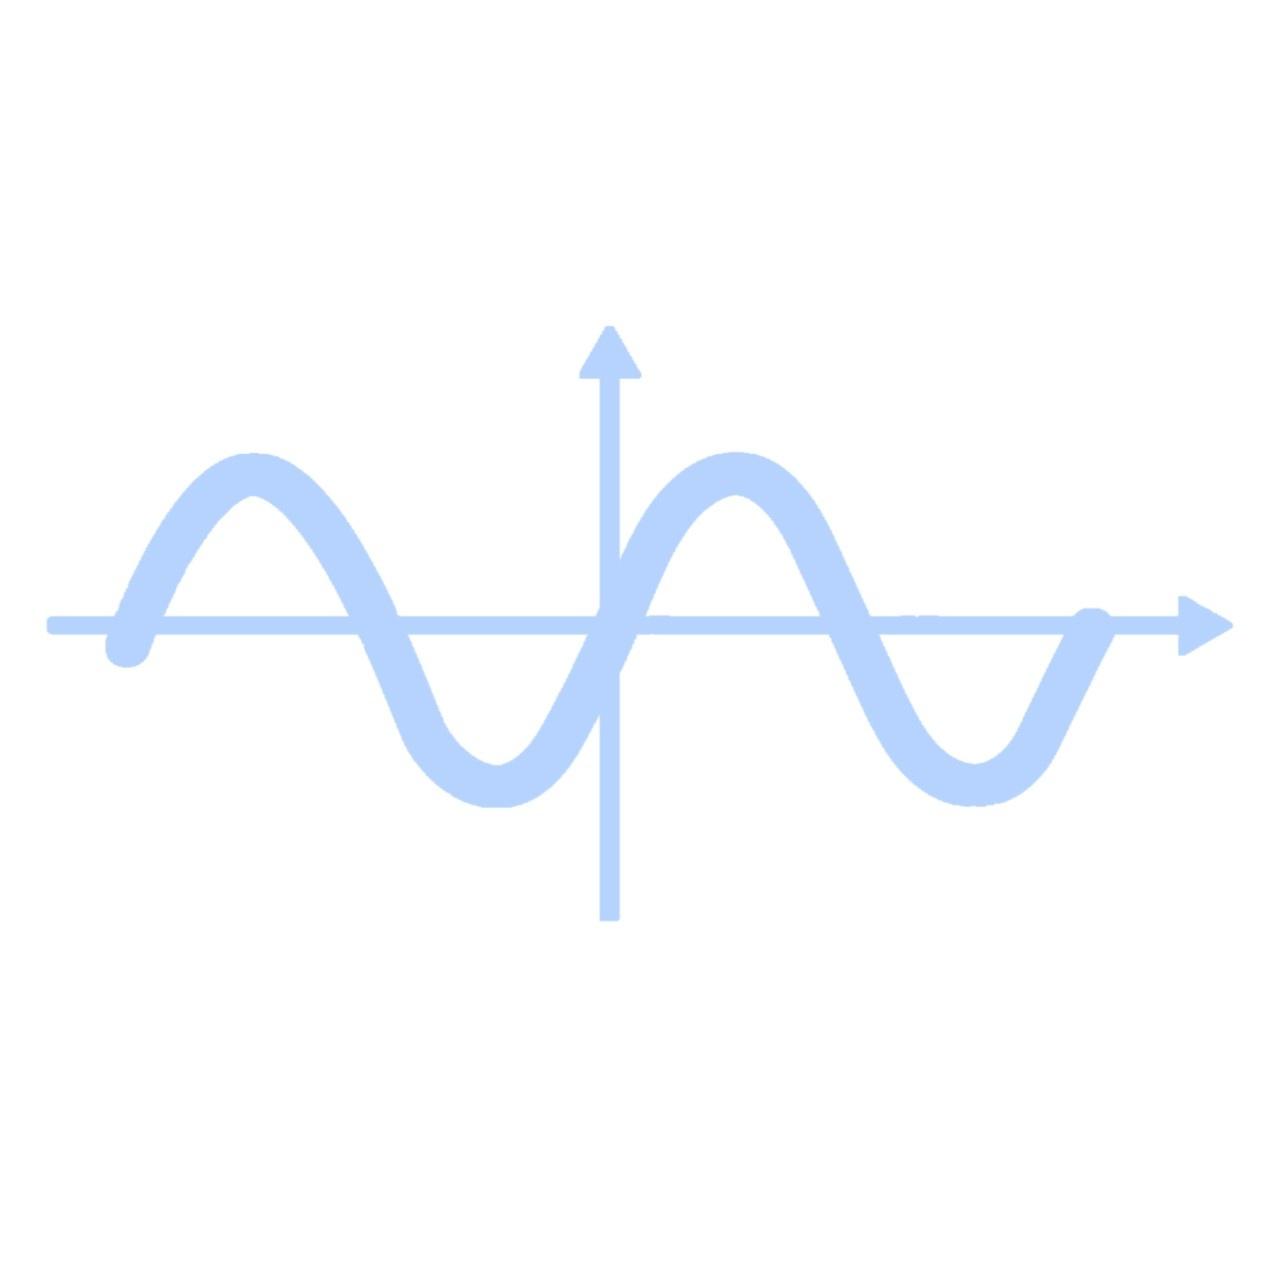 sinewaveform.jpg